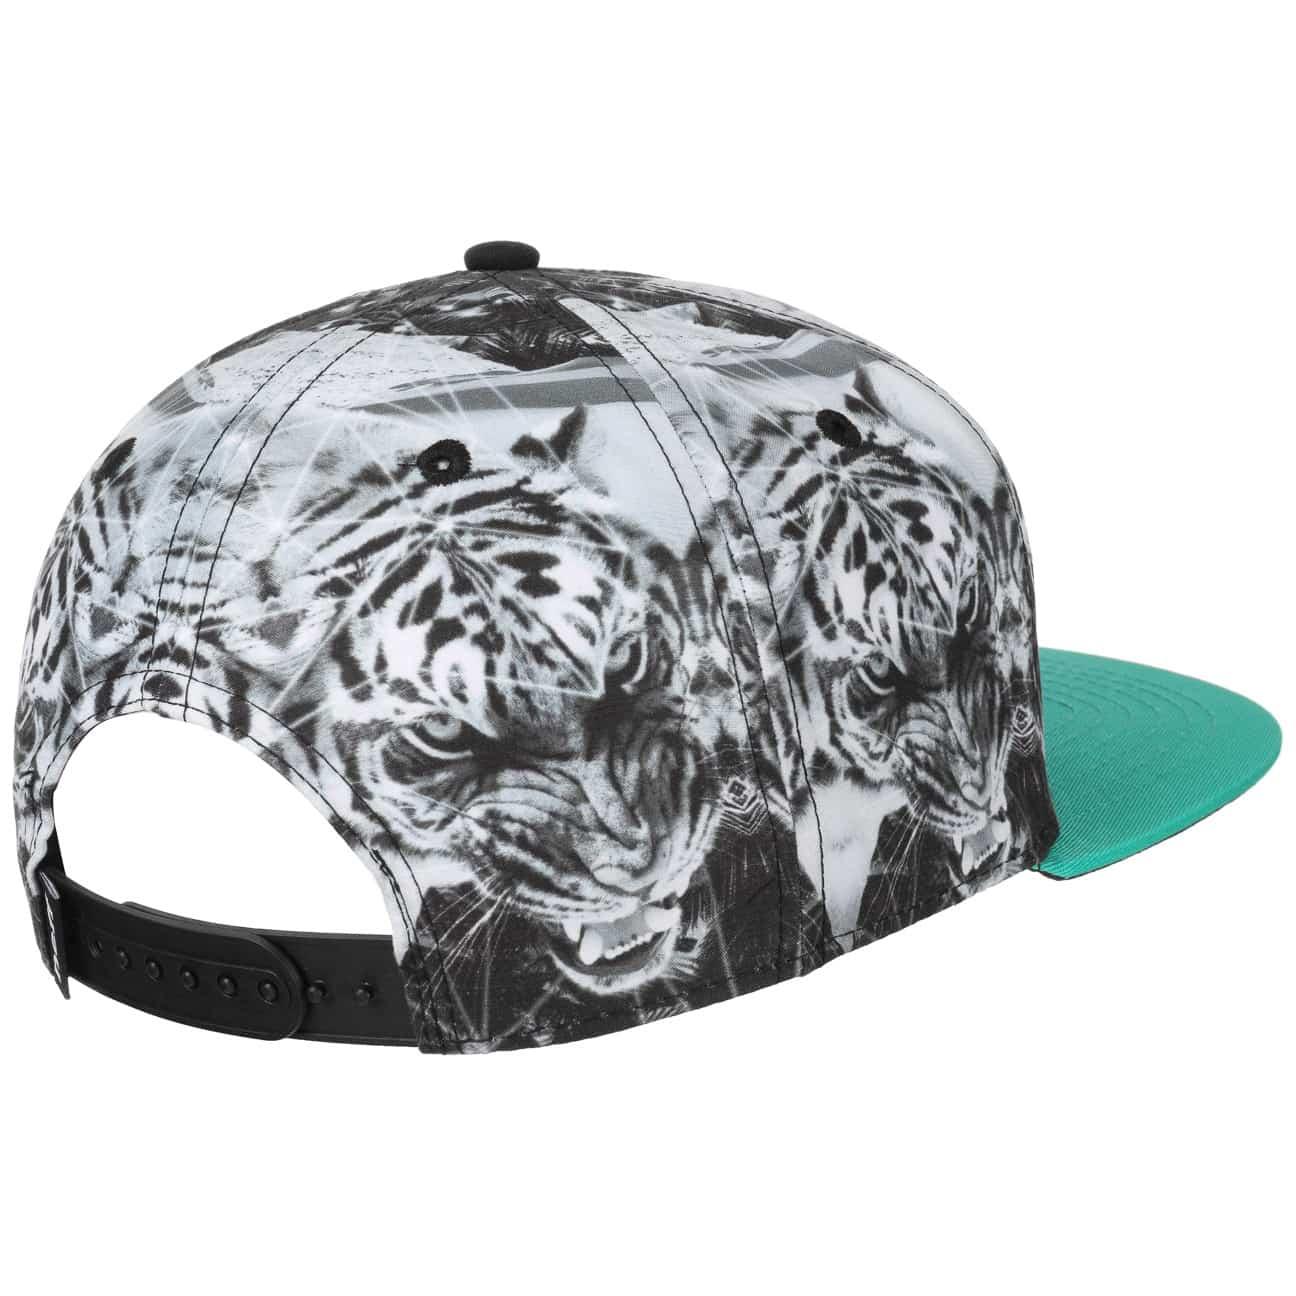 tiger snapback cap by neff eur 34 90 hats caps beanies shop online. Black Bedroom Furniture Sets. Home Design Ideas